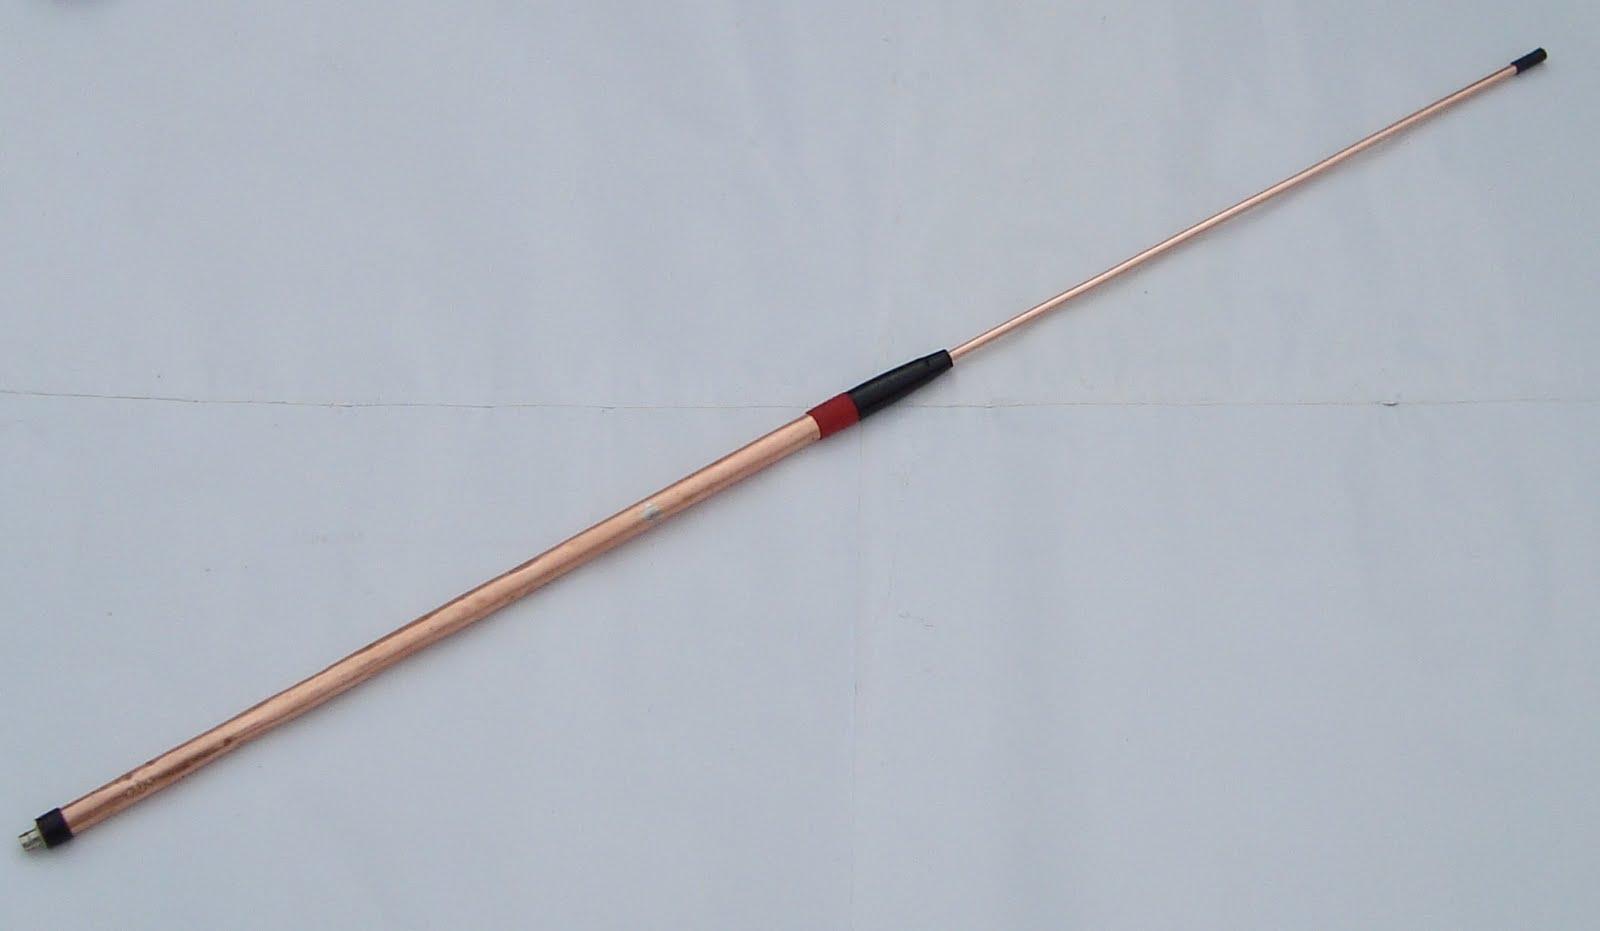 2M dipole antenna